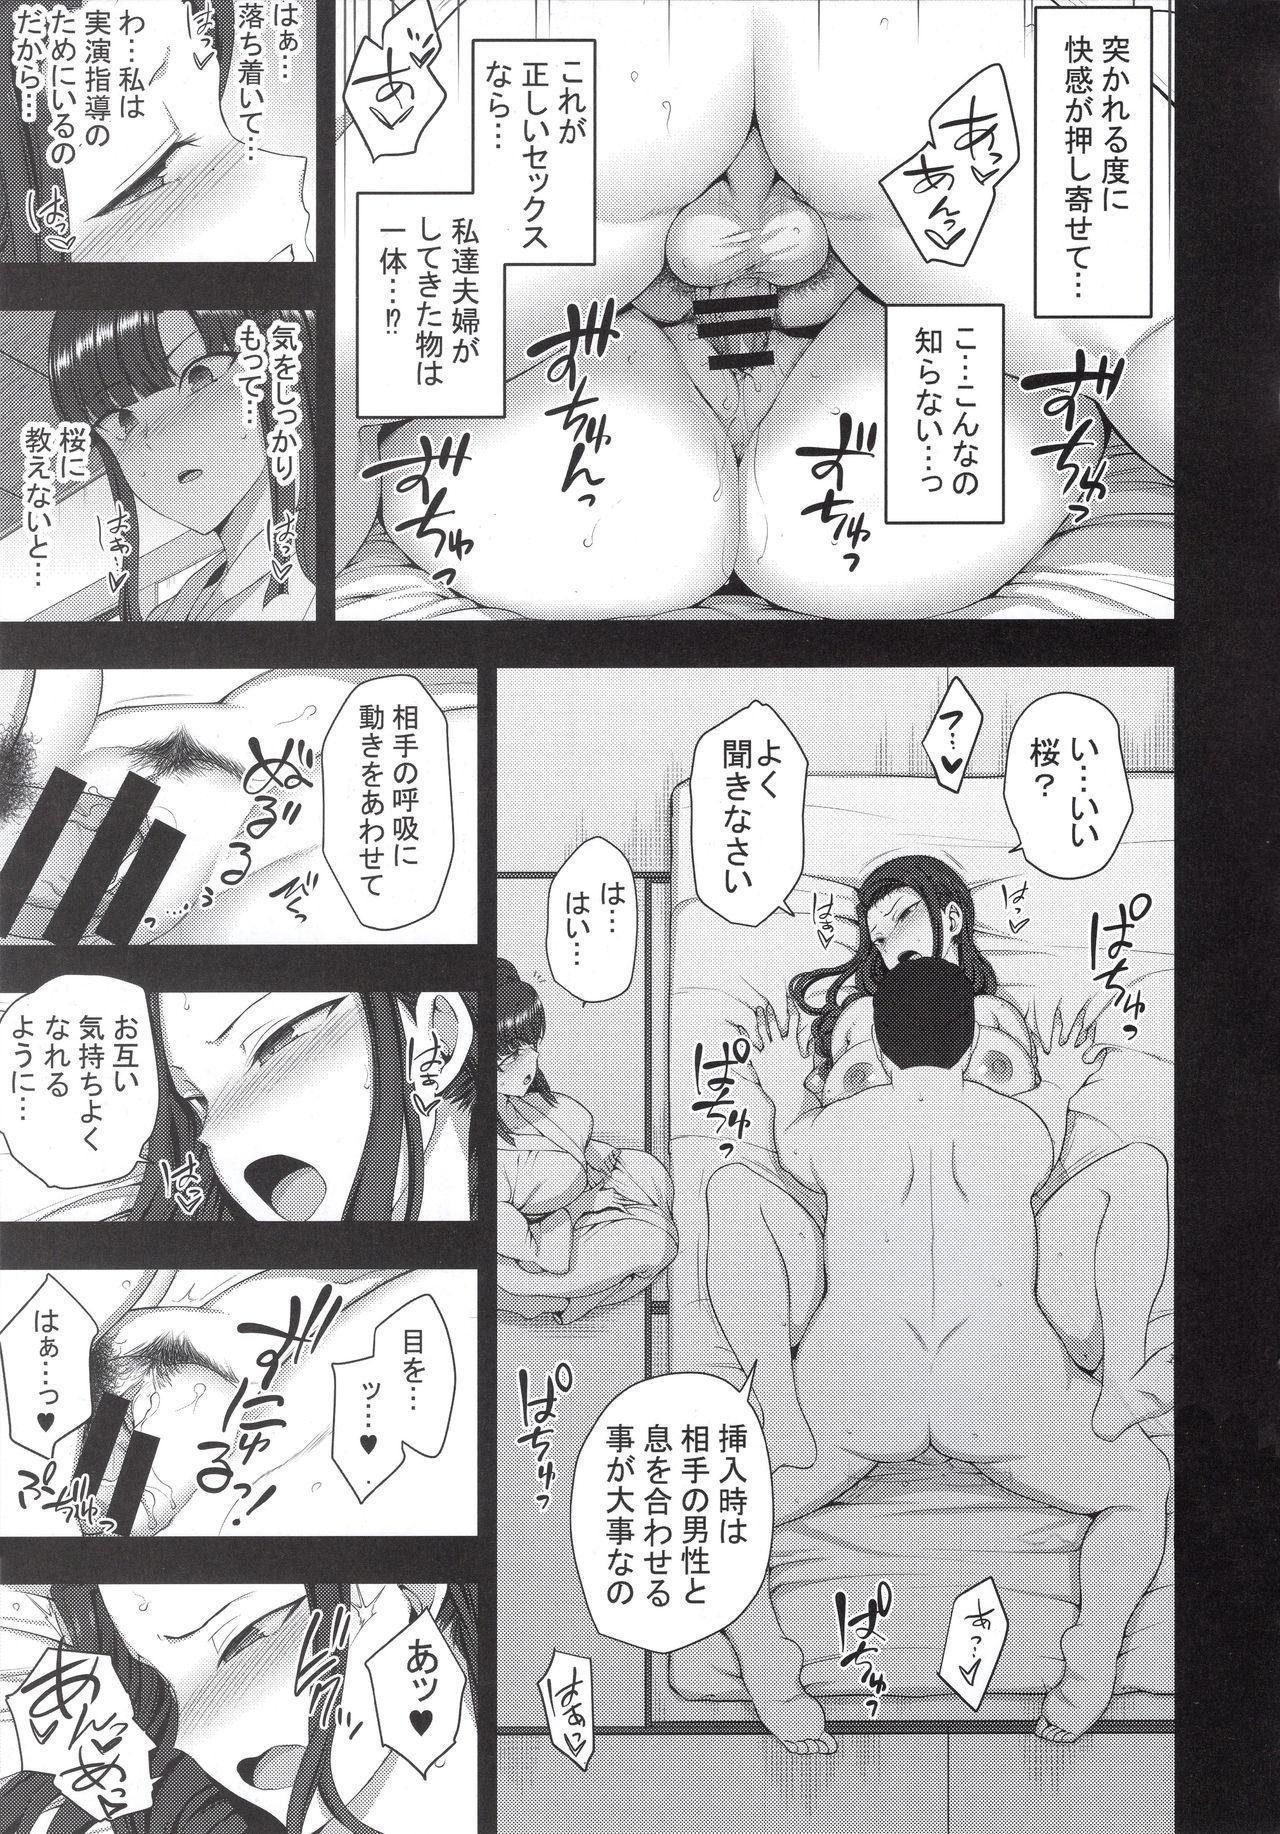 Saimin Seishidou 4: Ninshin Taiken Shidou 51